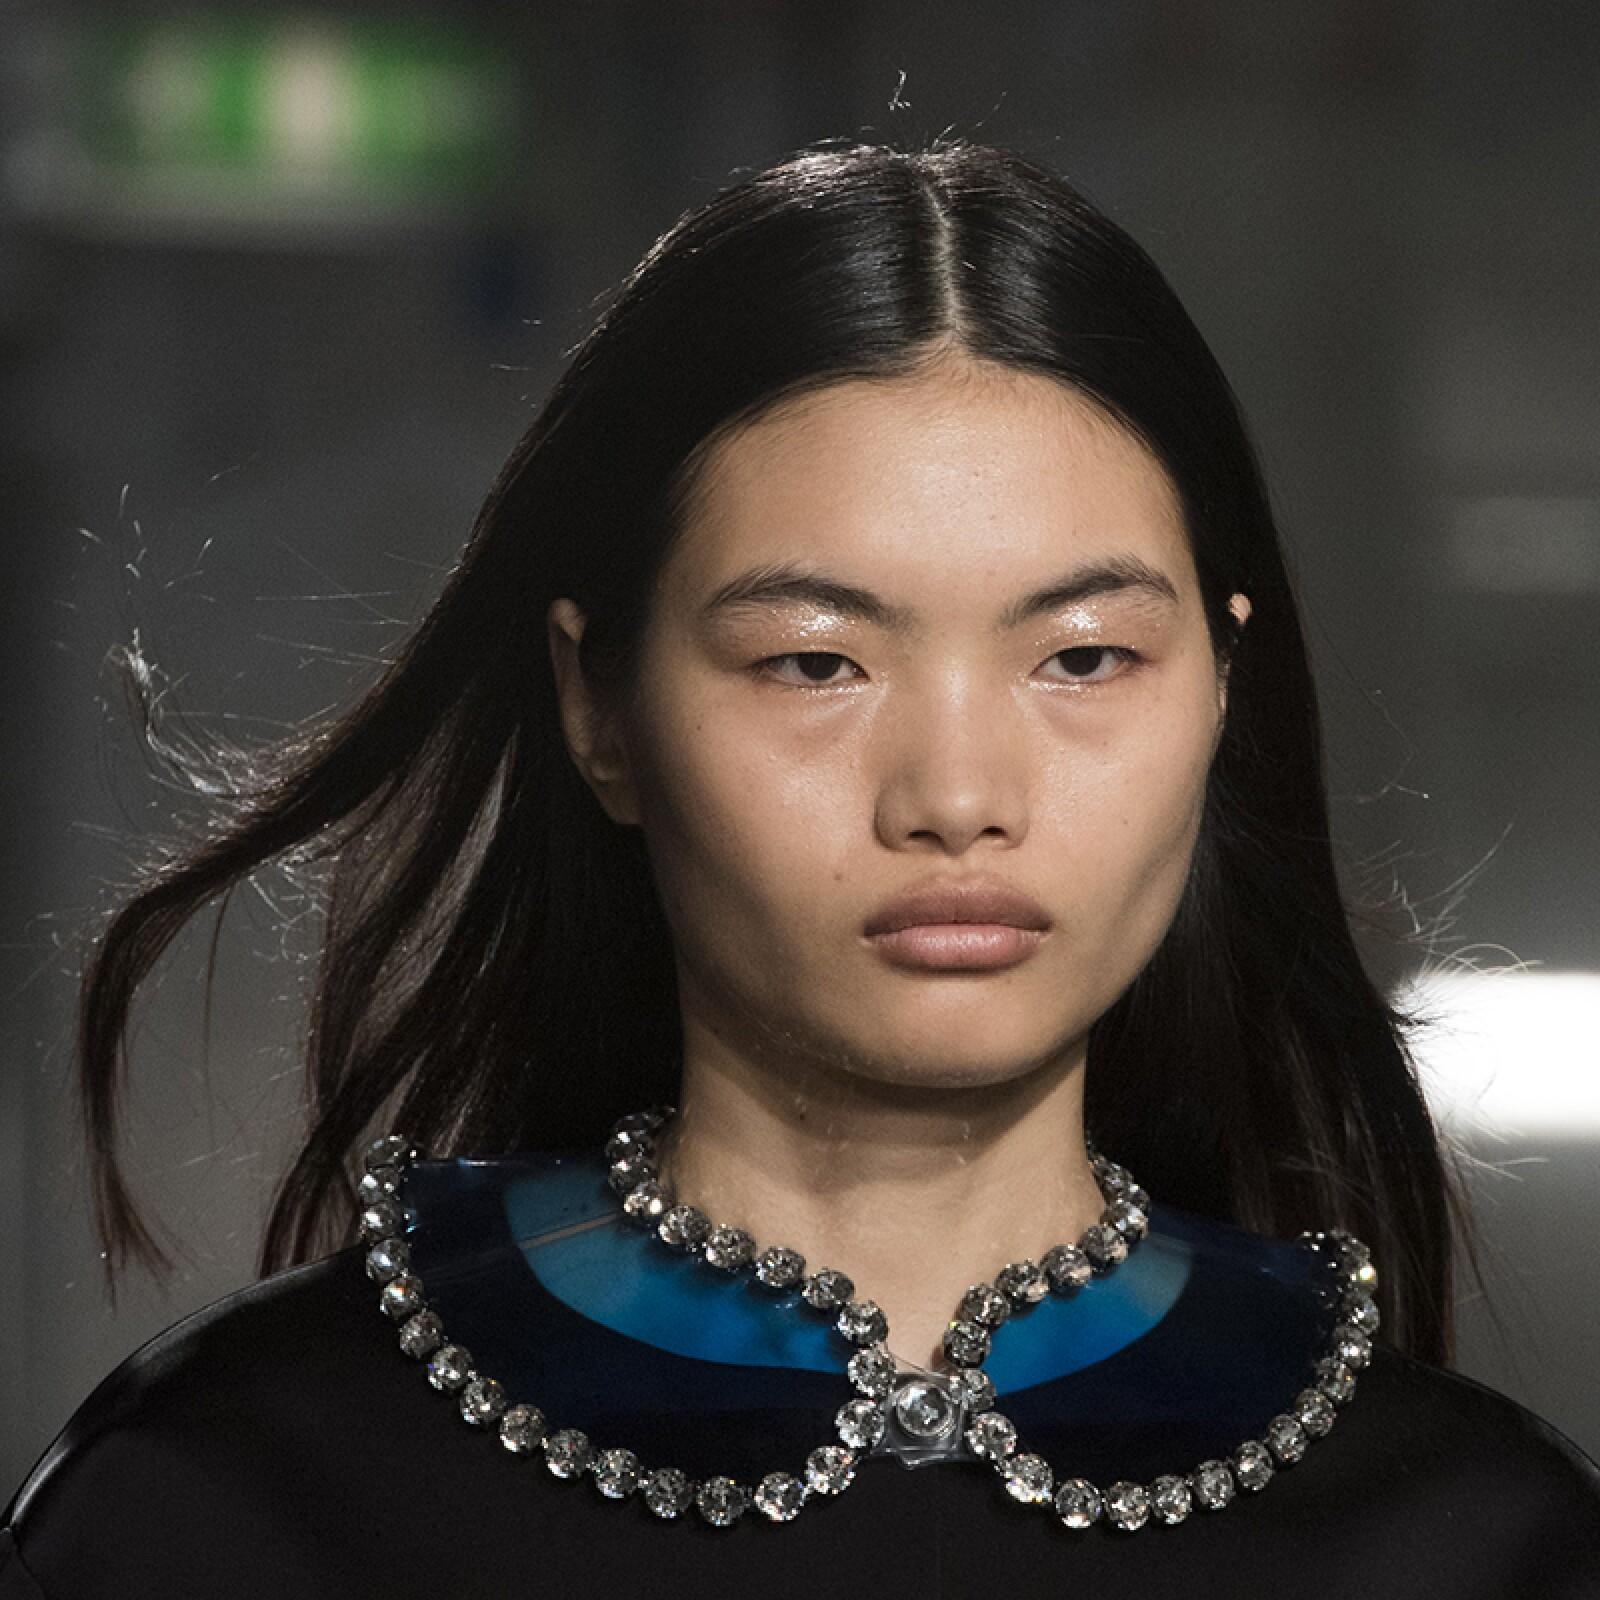 lfw-fashion-week-runway-beauty-looks-maquillaje-christopherkane